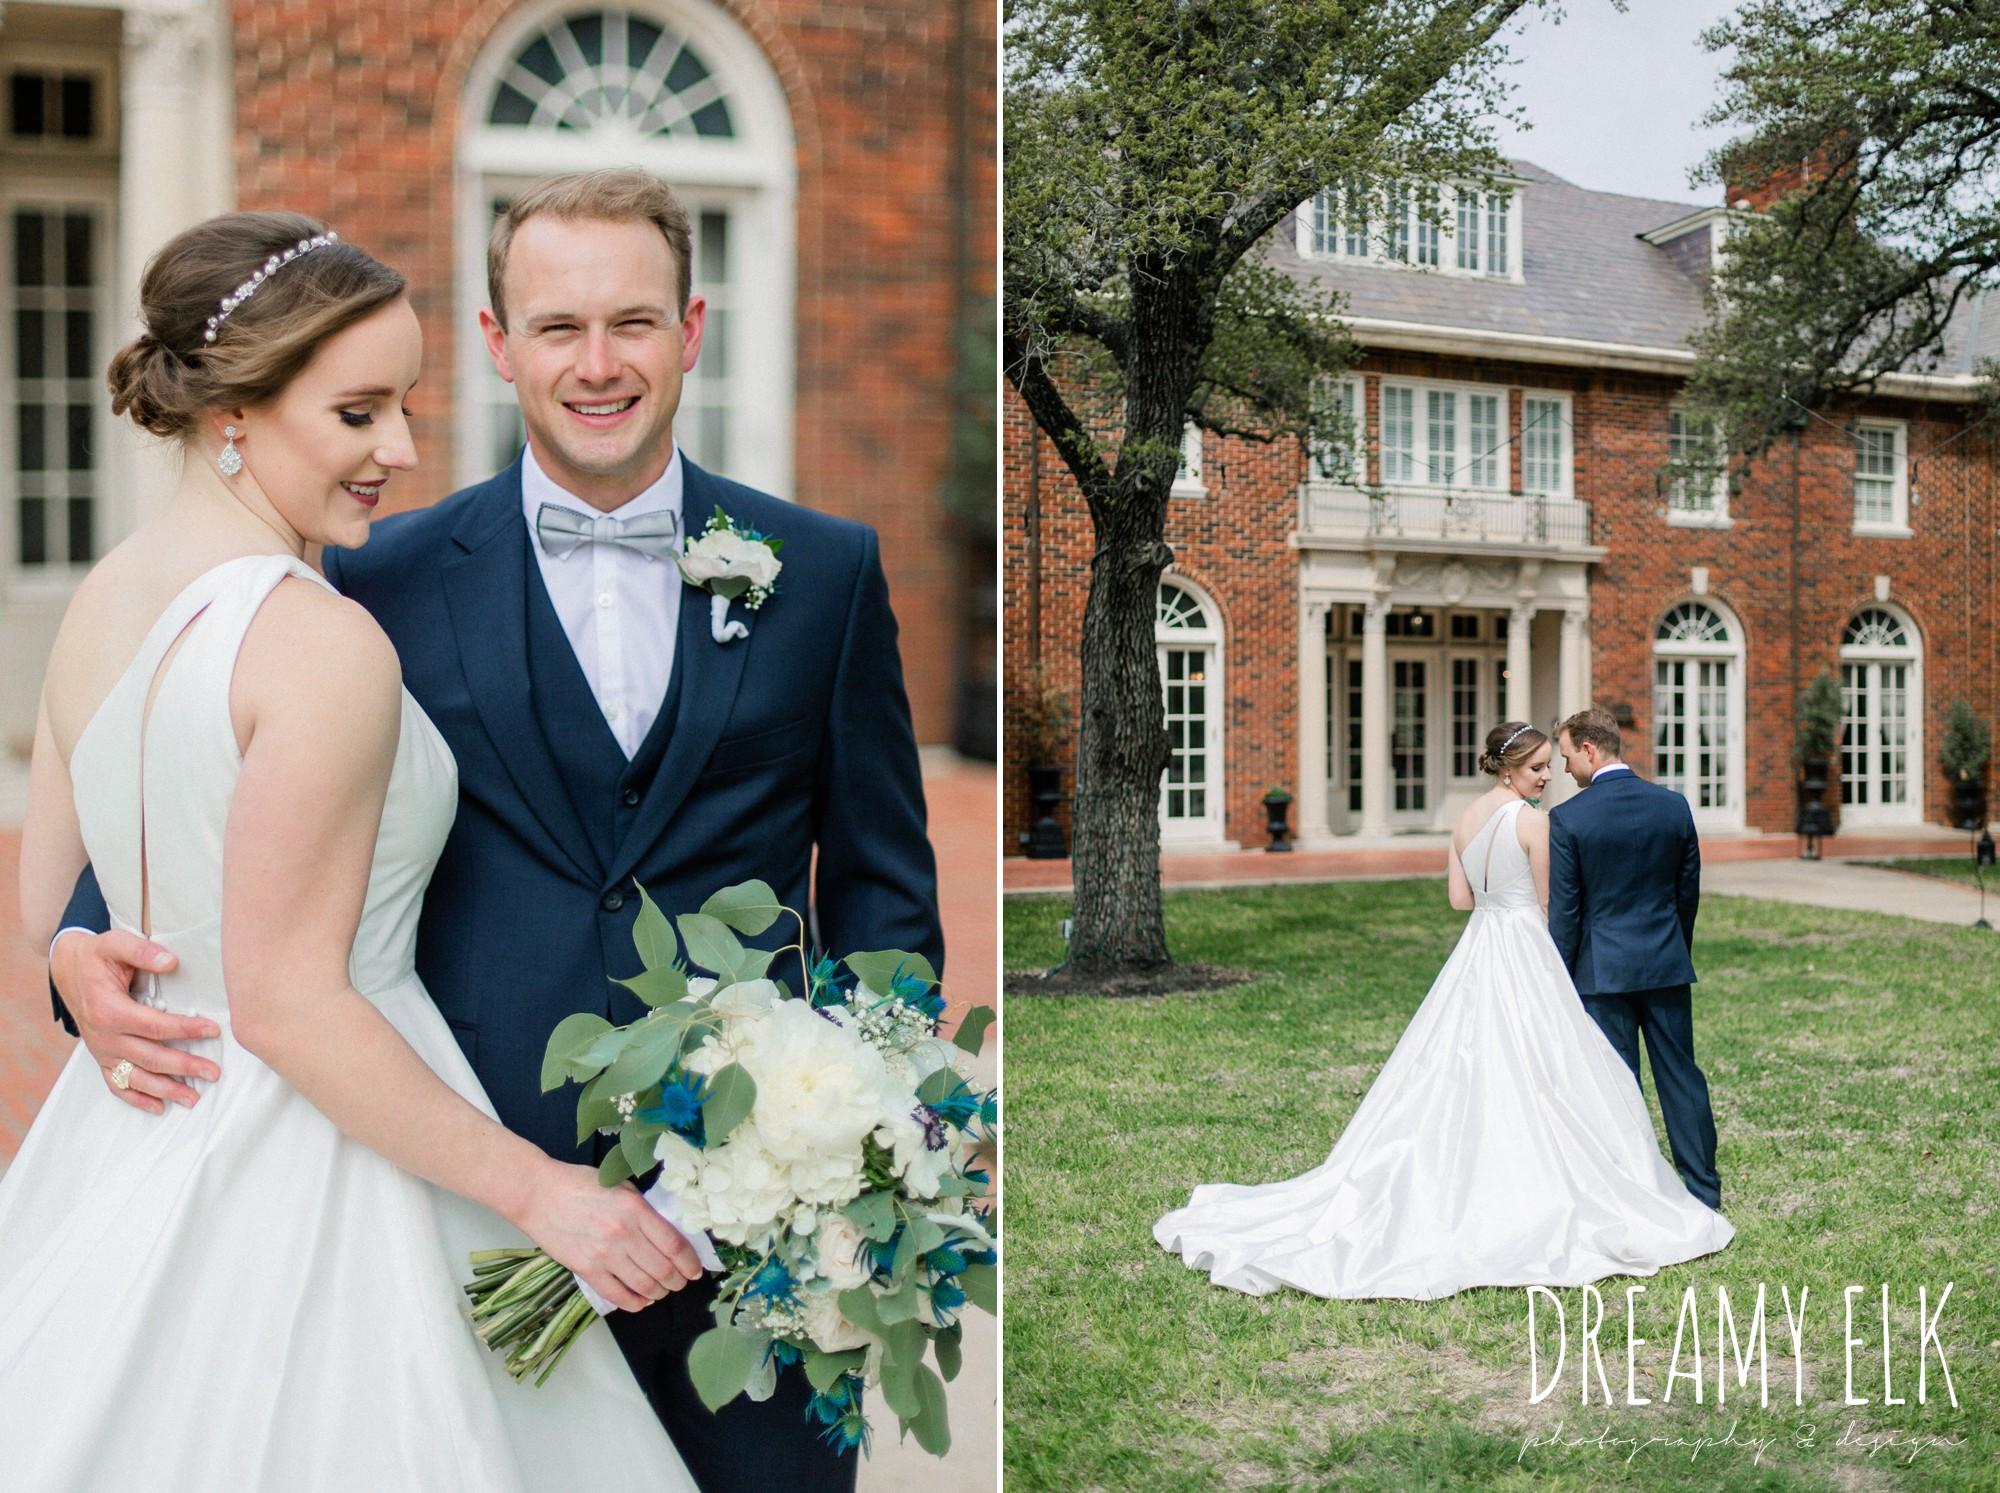 bride and groom, men's wearhouse, blue wedding bouquet, modern wedding dress ballgown, spring wedding, the astin mansion, bryan, texas, spring wedding, dreamy elk photography and design